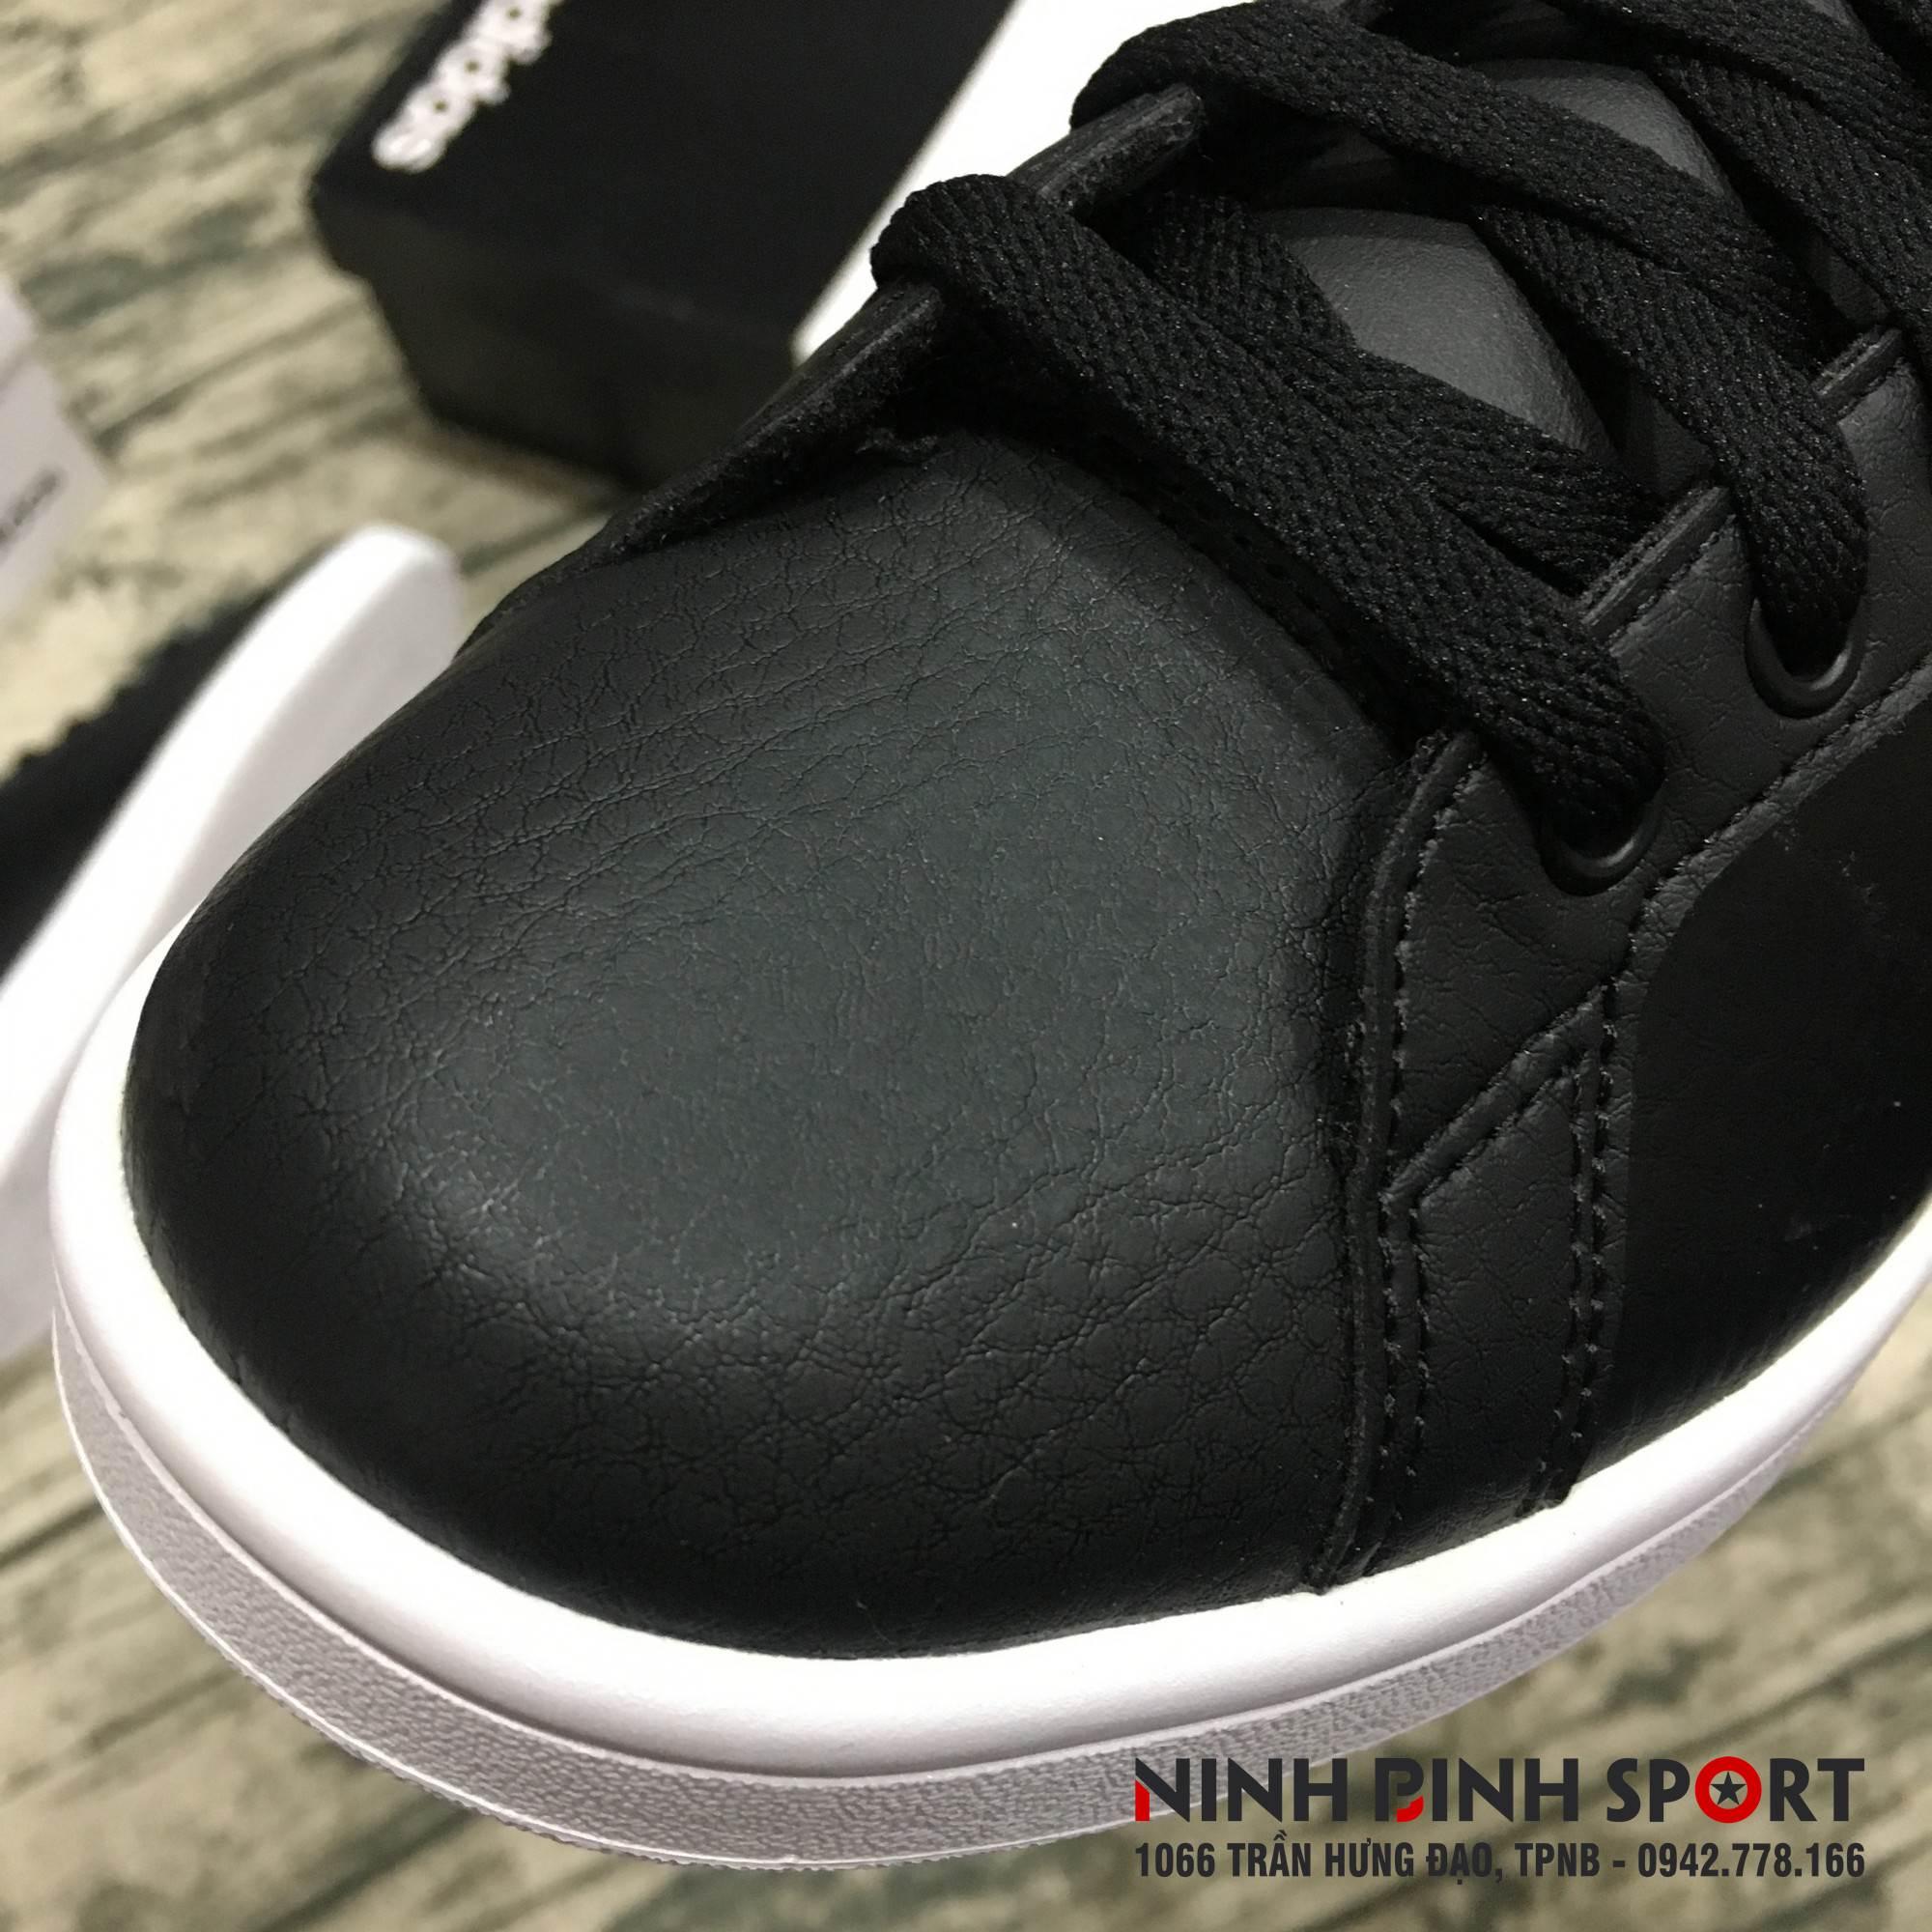 Giầy thể thao nam Adidas Neo Cloudfoam Advantage AW3915